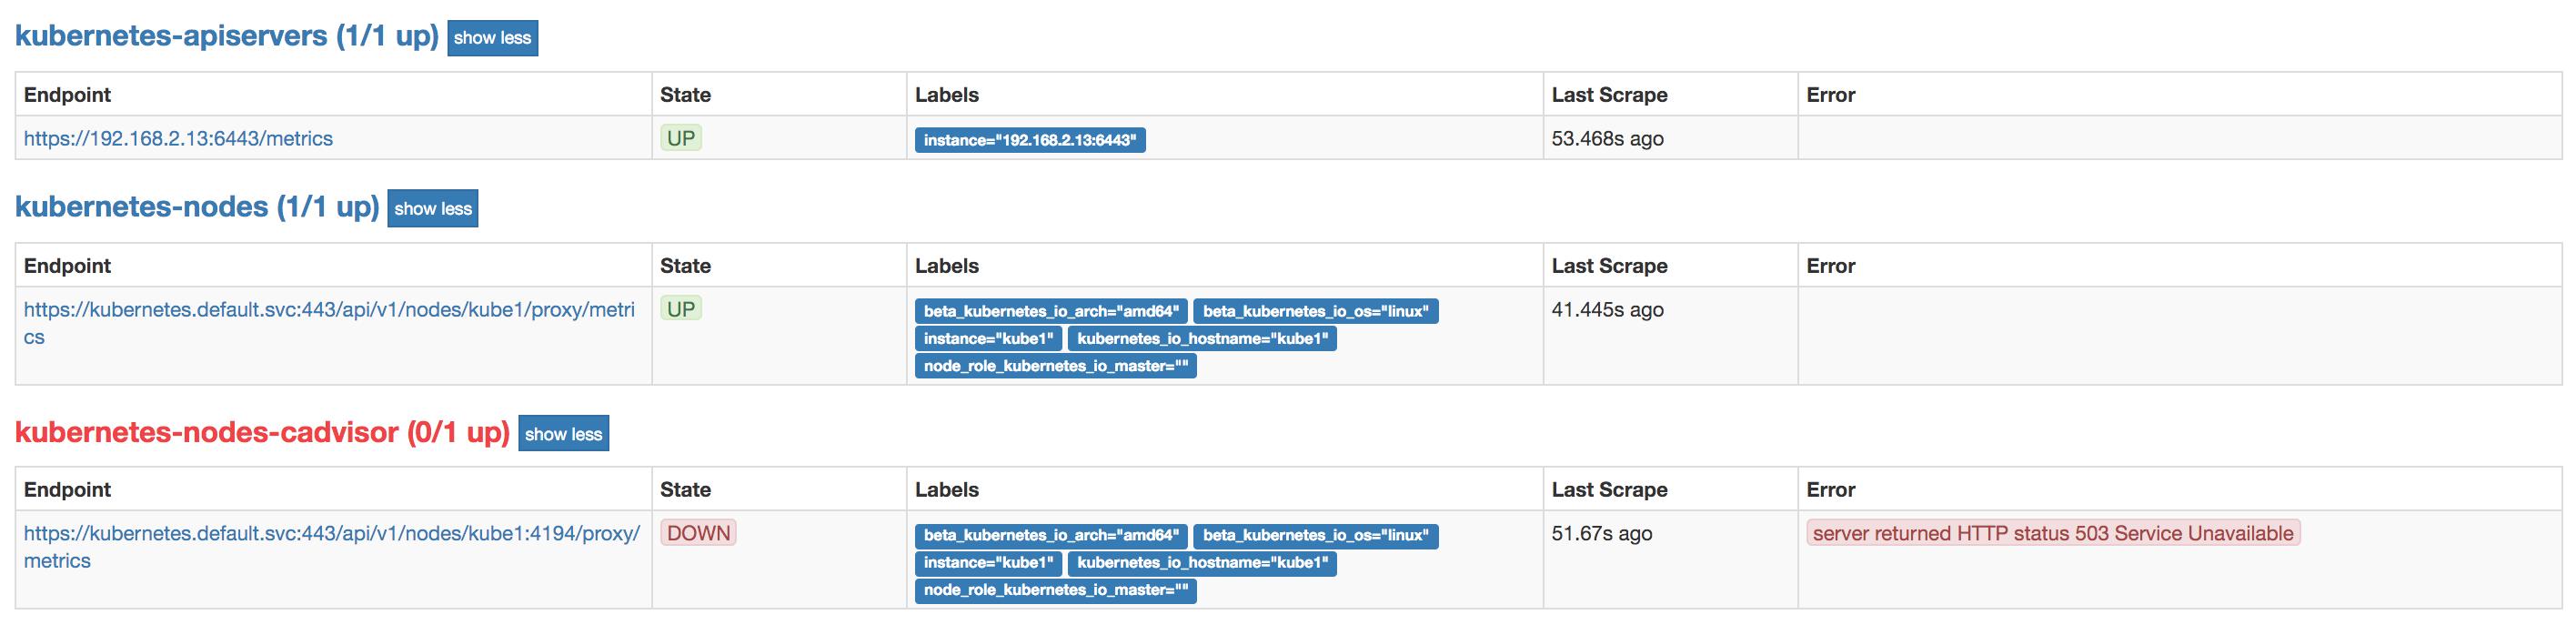 Prometheus problem with container metrics (cAdvisor)   cwienczek com